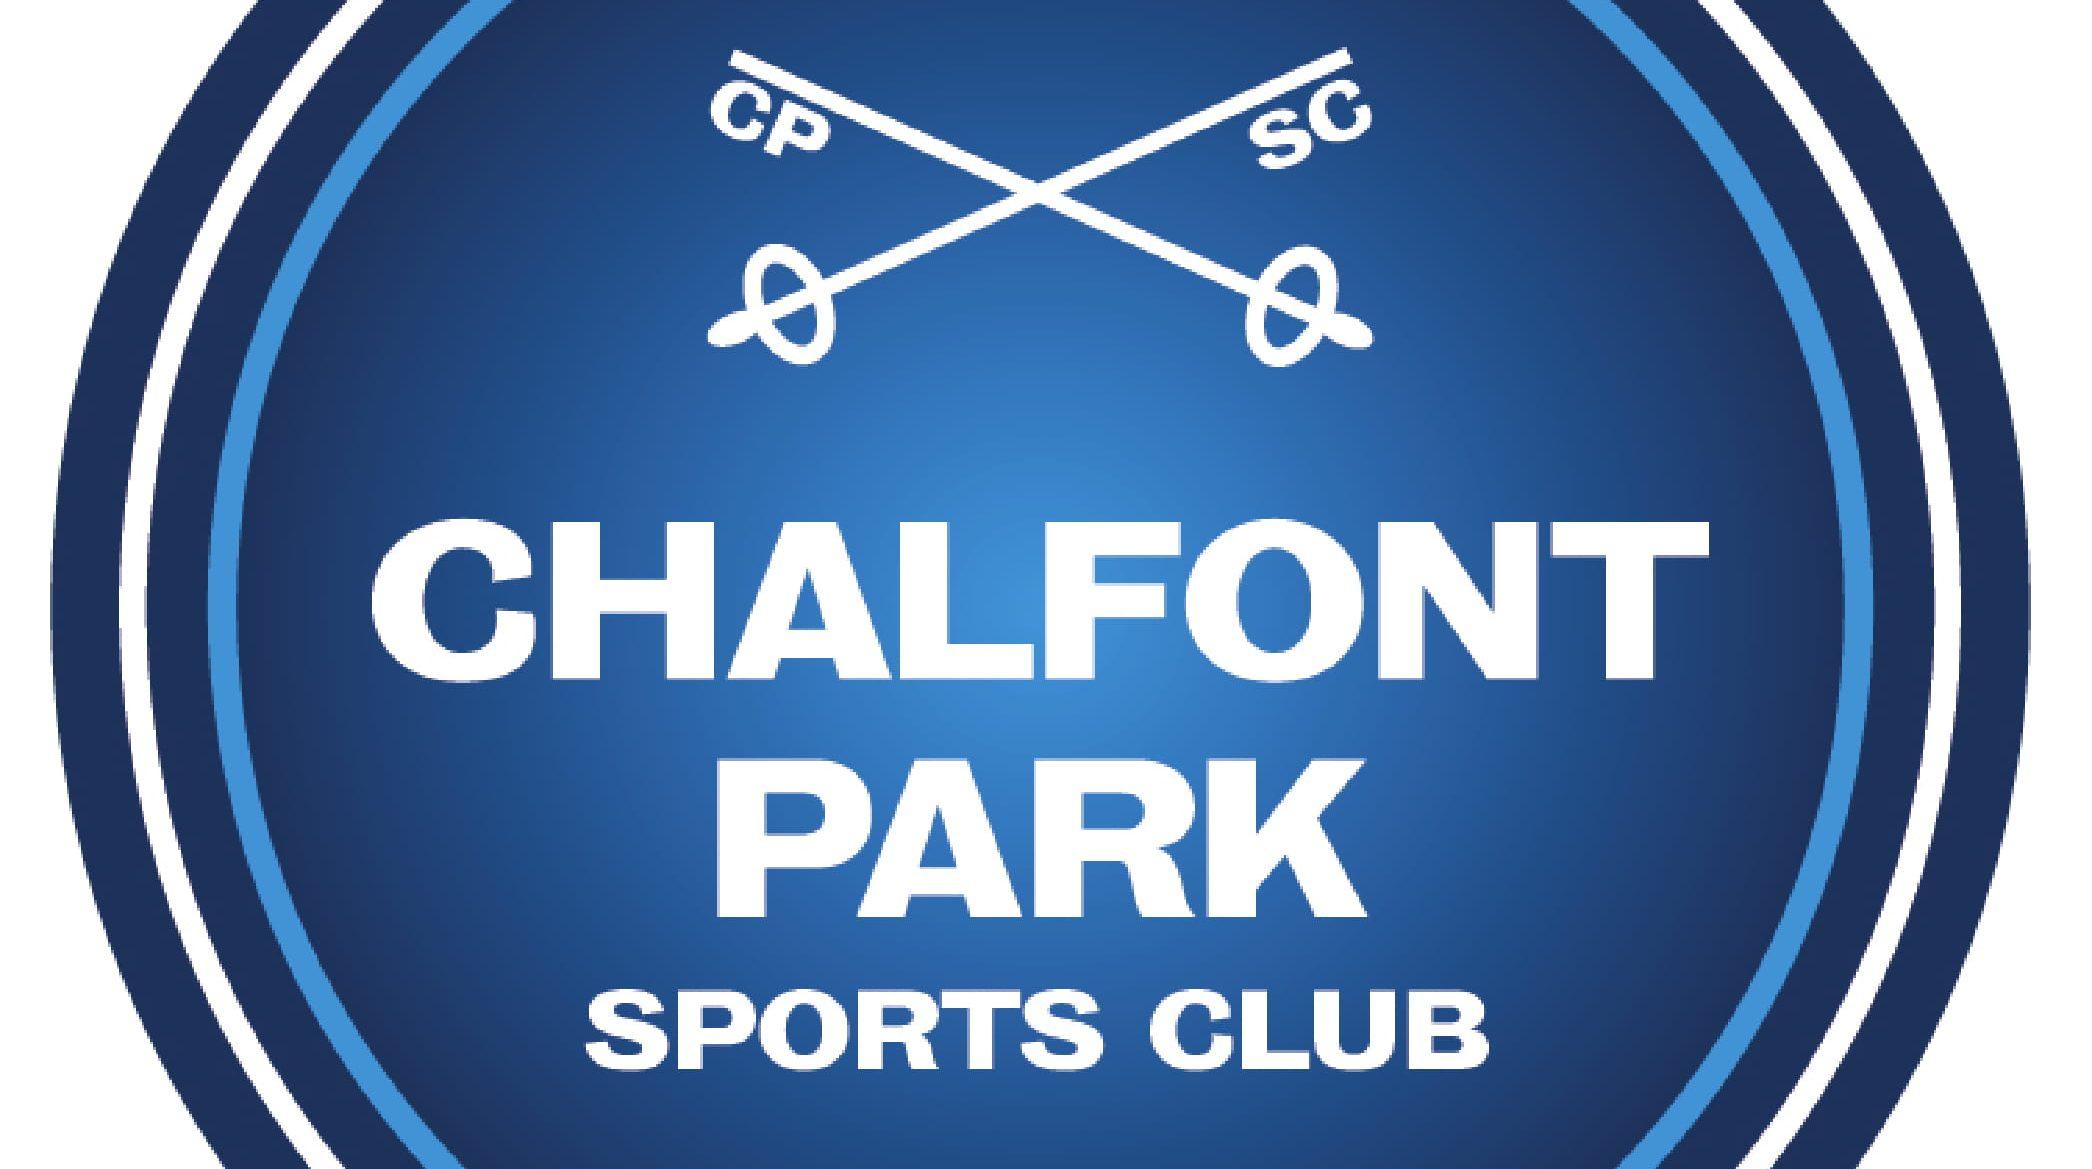 Chalfont Park Sports Club